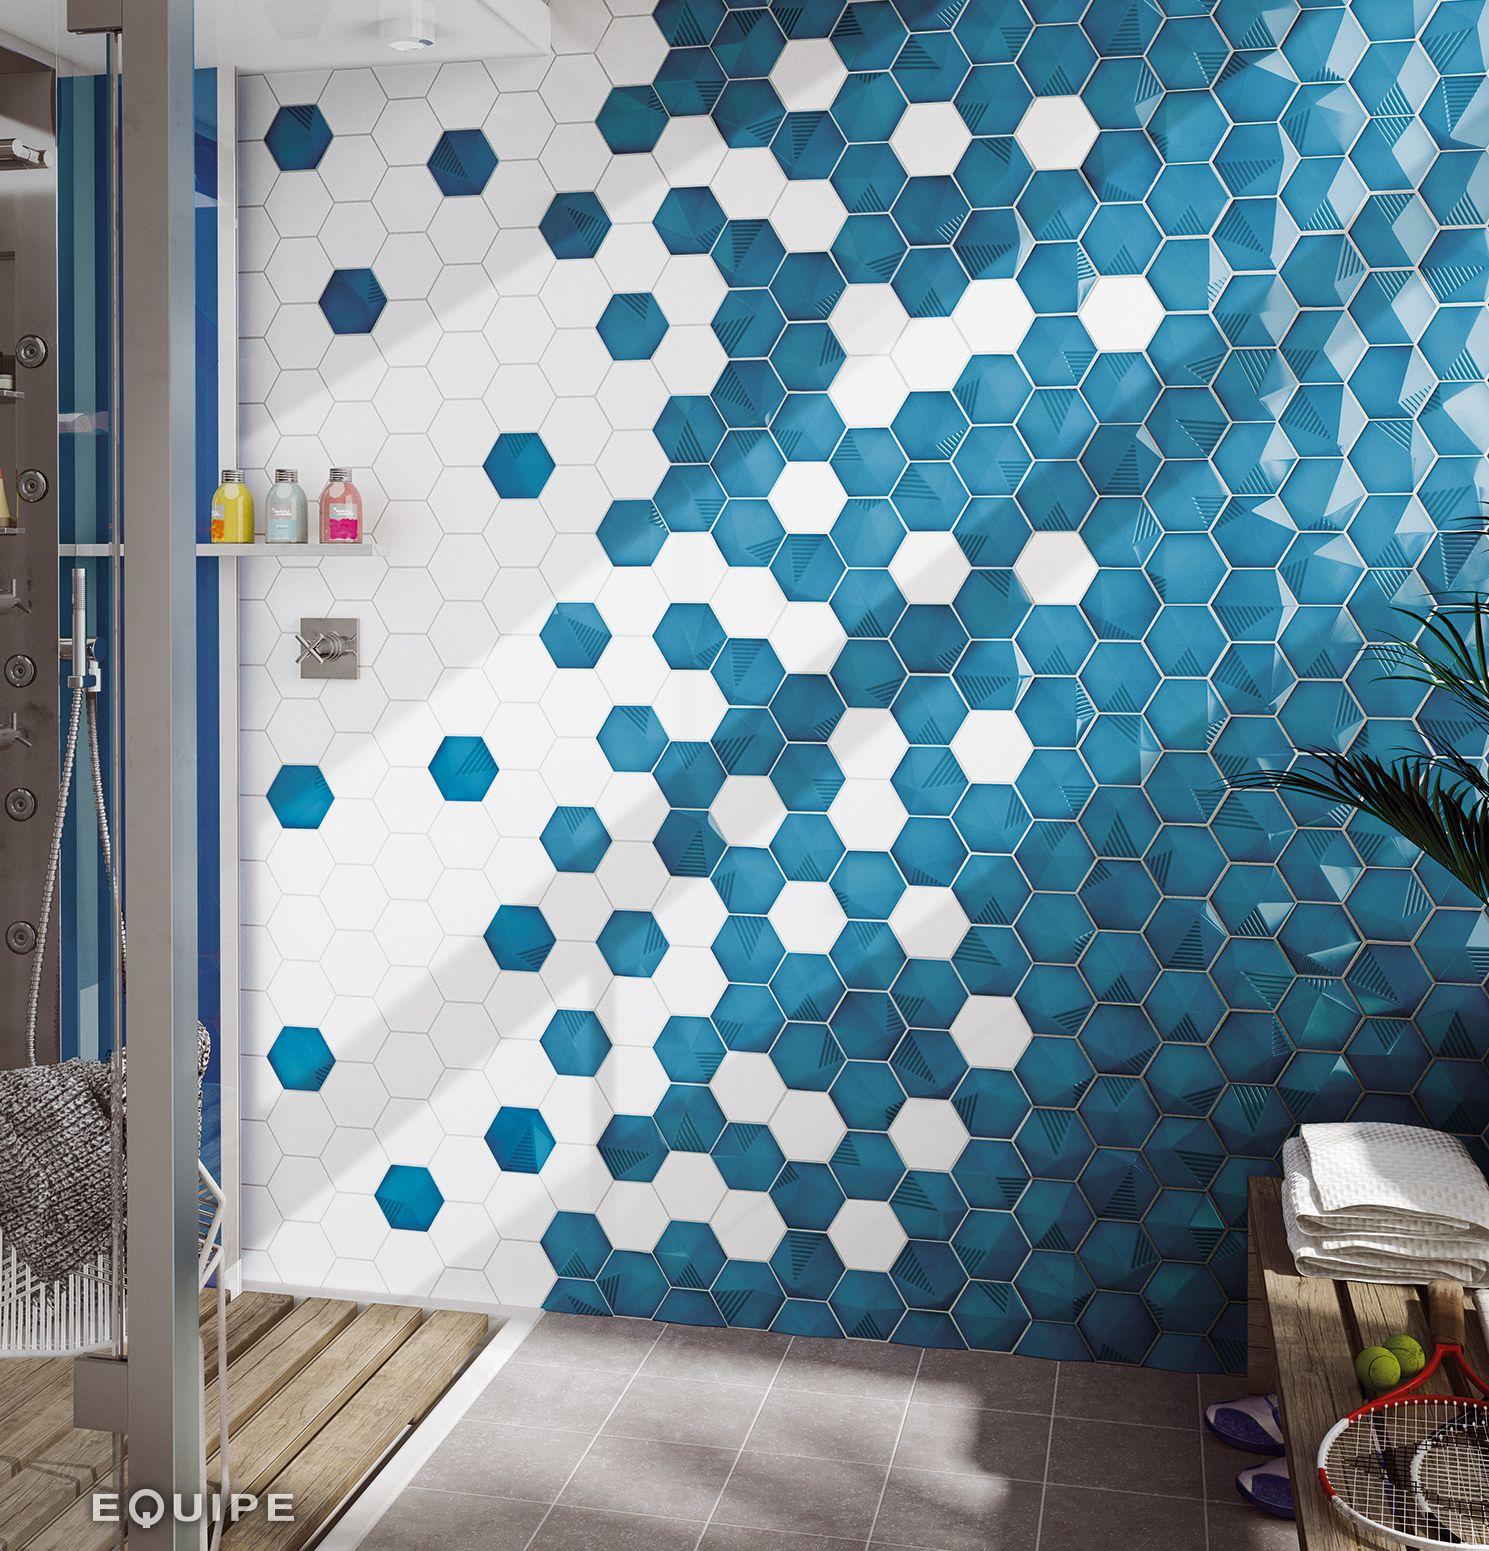 Magical 3 Umbrella Electric Blue / Scale Hexagon White 12,4x10,7 cm ...